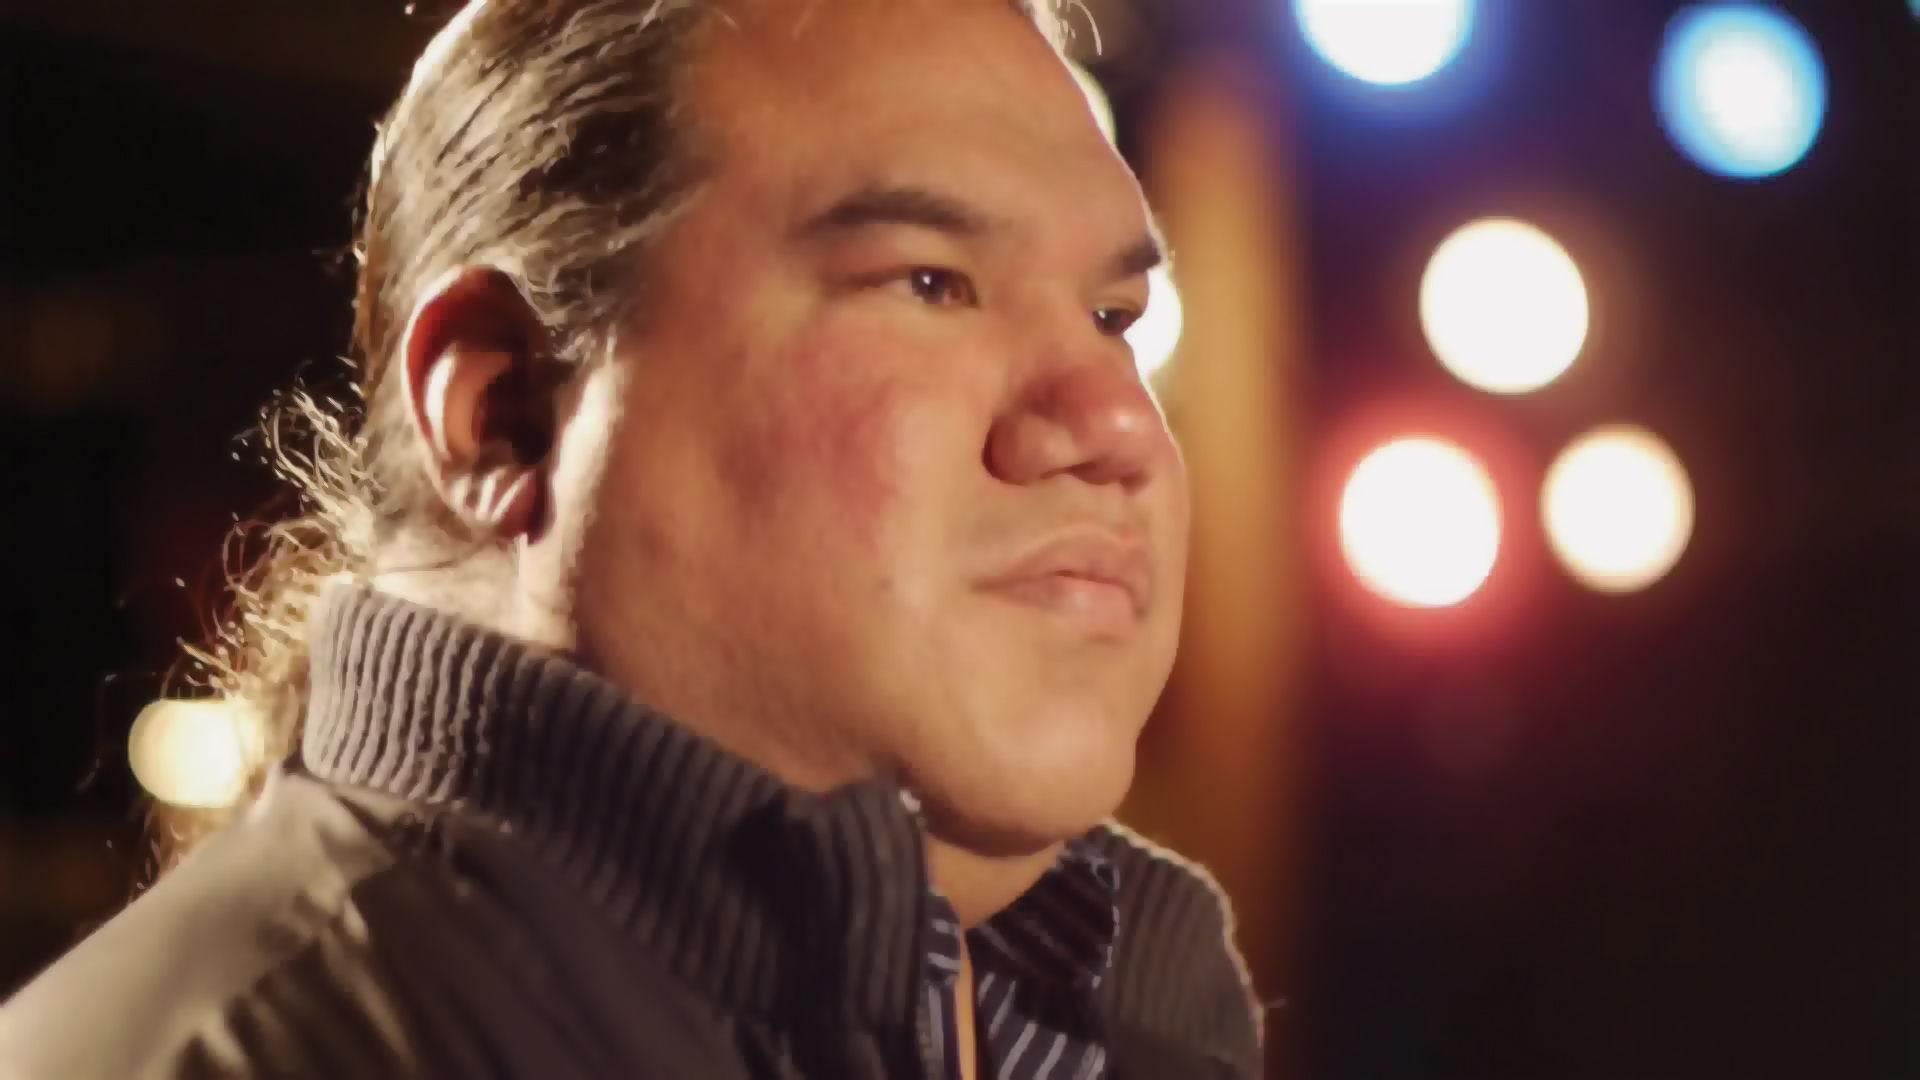 Producer Profile Chris Eyre (Southern Cheyenne/Arapaho